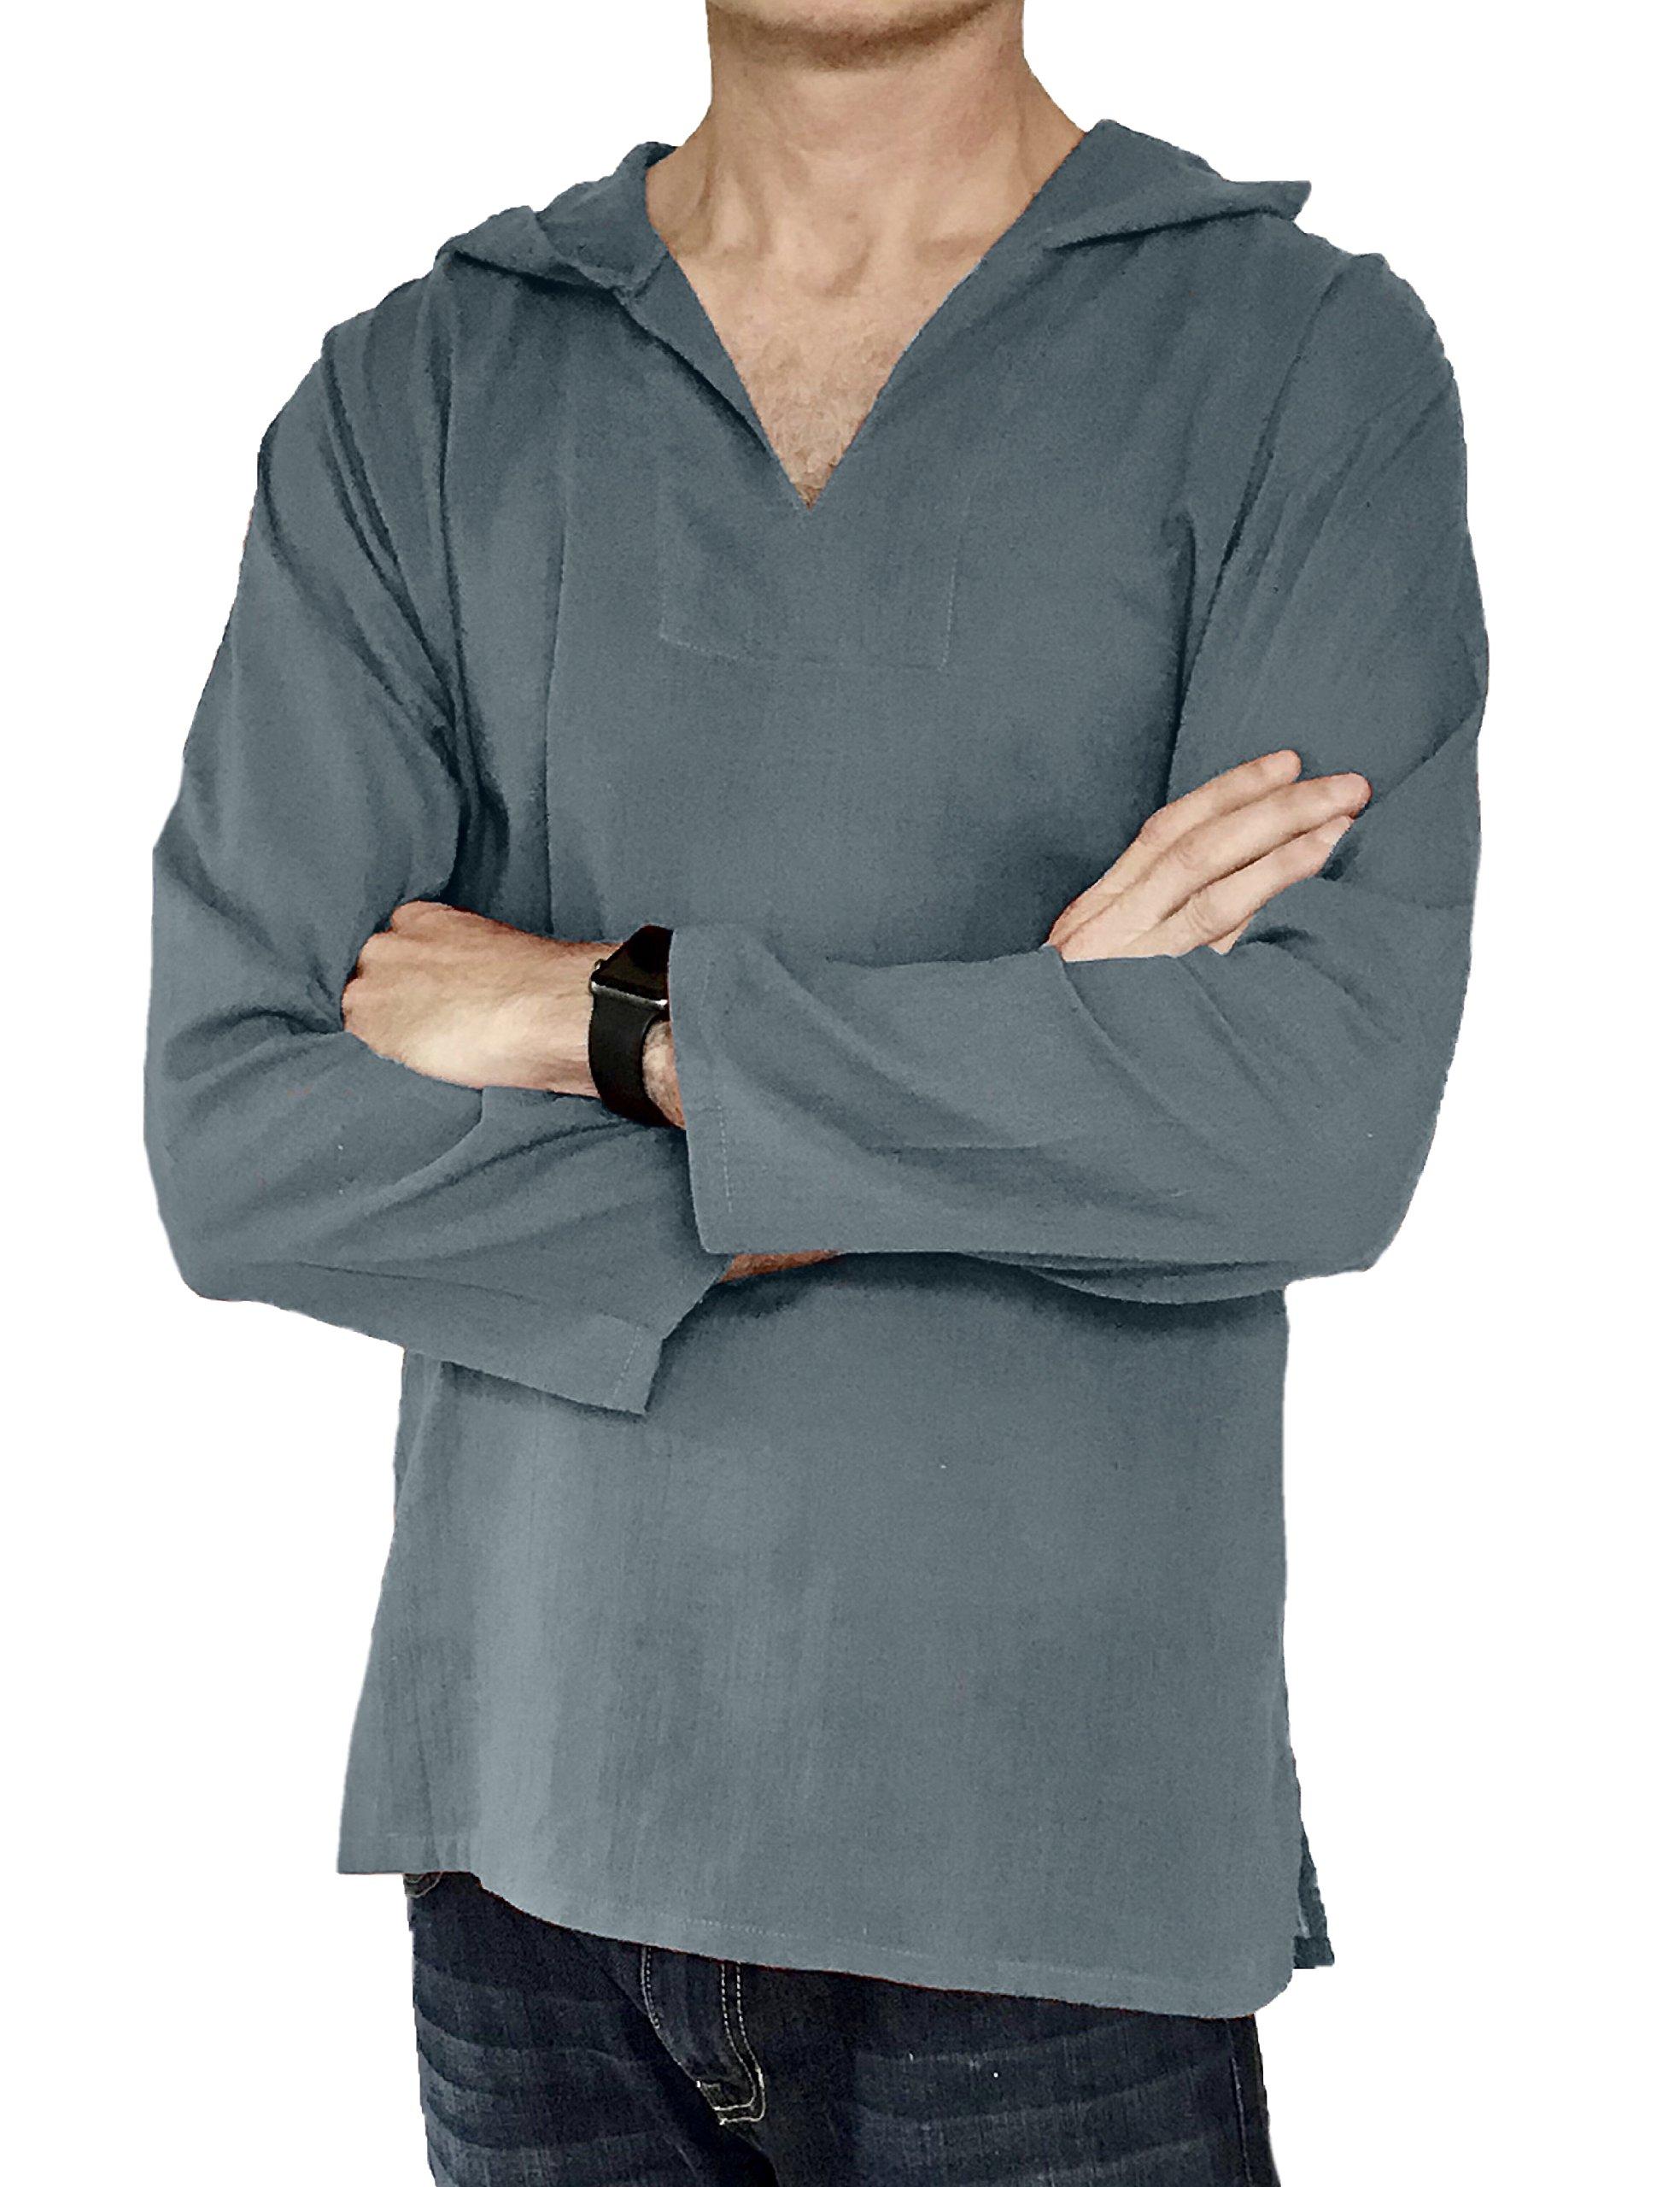 Love Quality Men's Hoodie Hippie Shirts Beach 100% Soft Cotton Top Yoga Shirt Boho (X-Large, Grey)